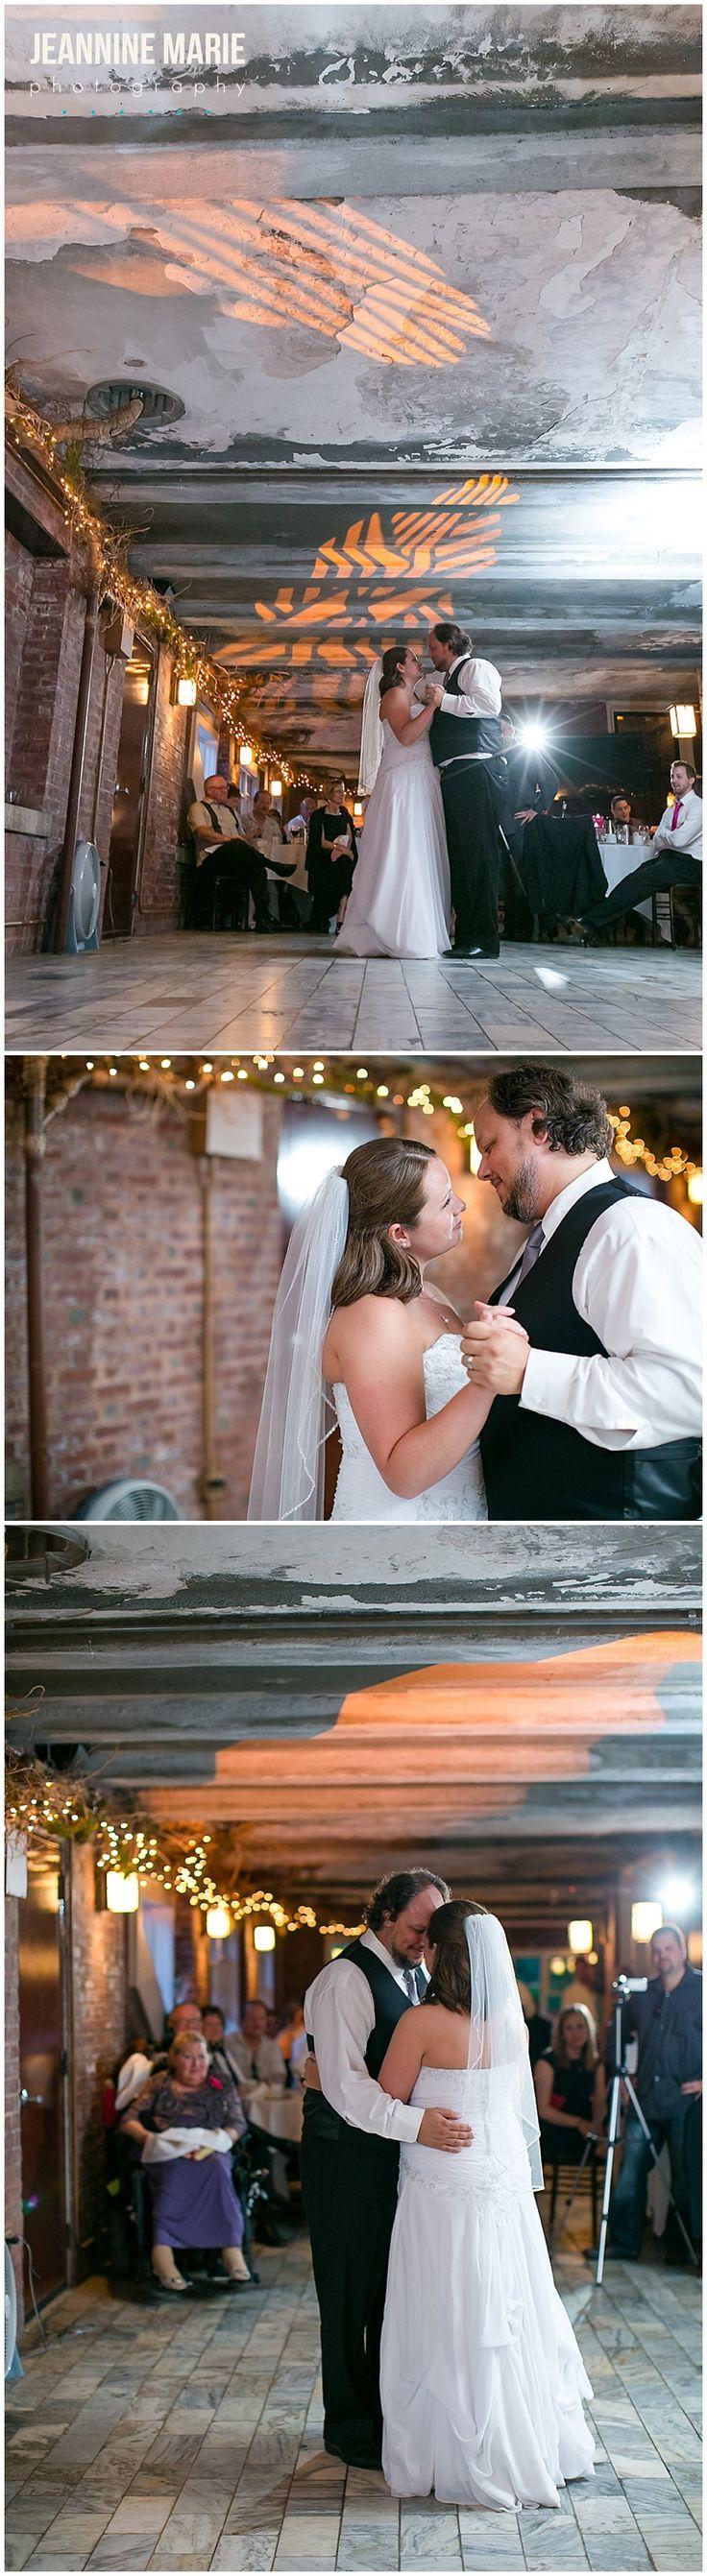 First dance at Glensheen Mansion in Duluth, MN. Photo by Minnesota wedding photographer, Jeannine Marie Photography. #duluthweddings #wedding #glensheenmansion #mansionweddings #firstdance #duluthweddingphotographer #saintpaulweddingphotographer #jeanninemariephotography